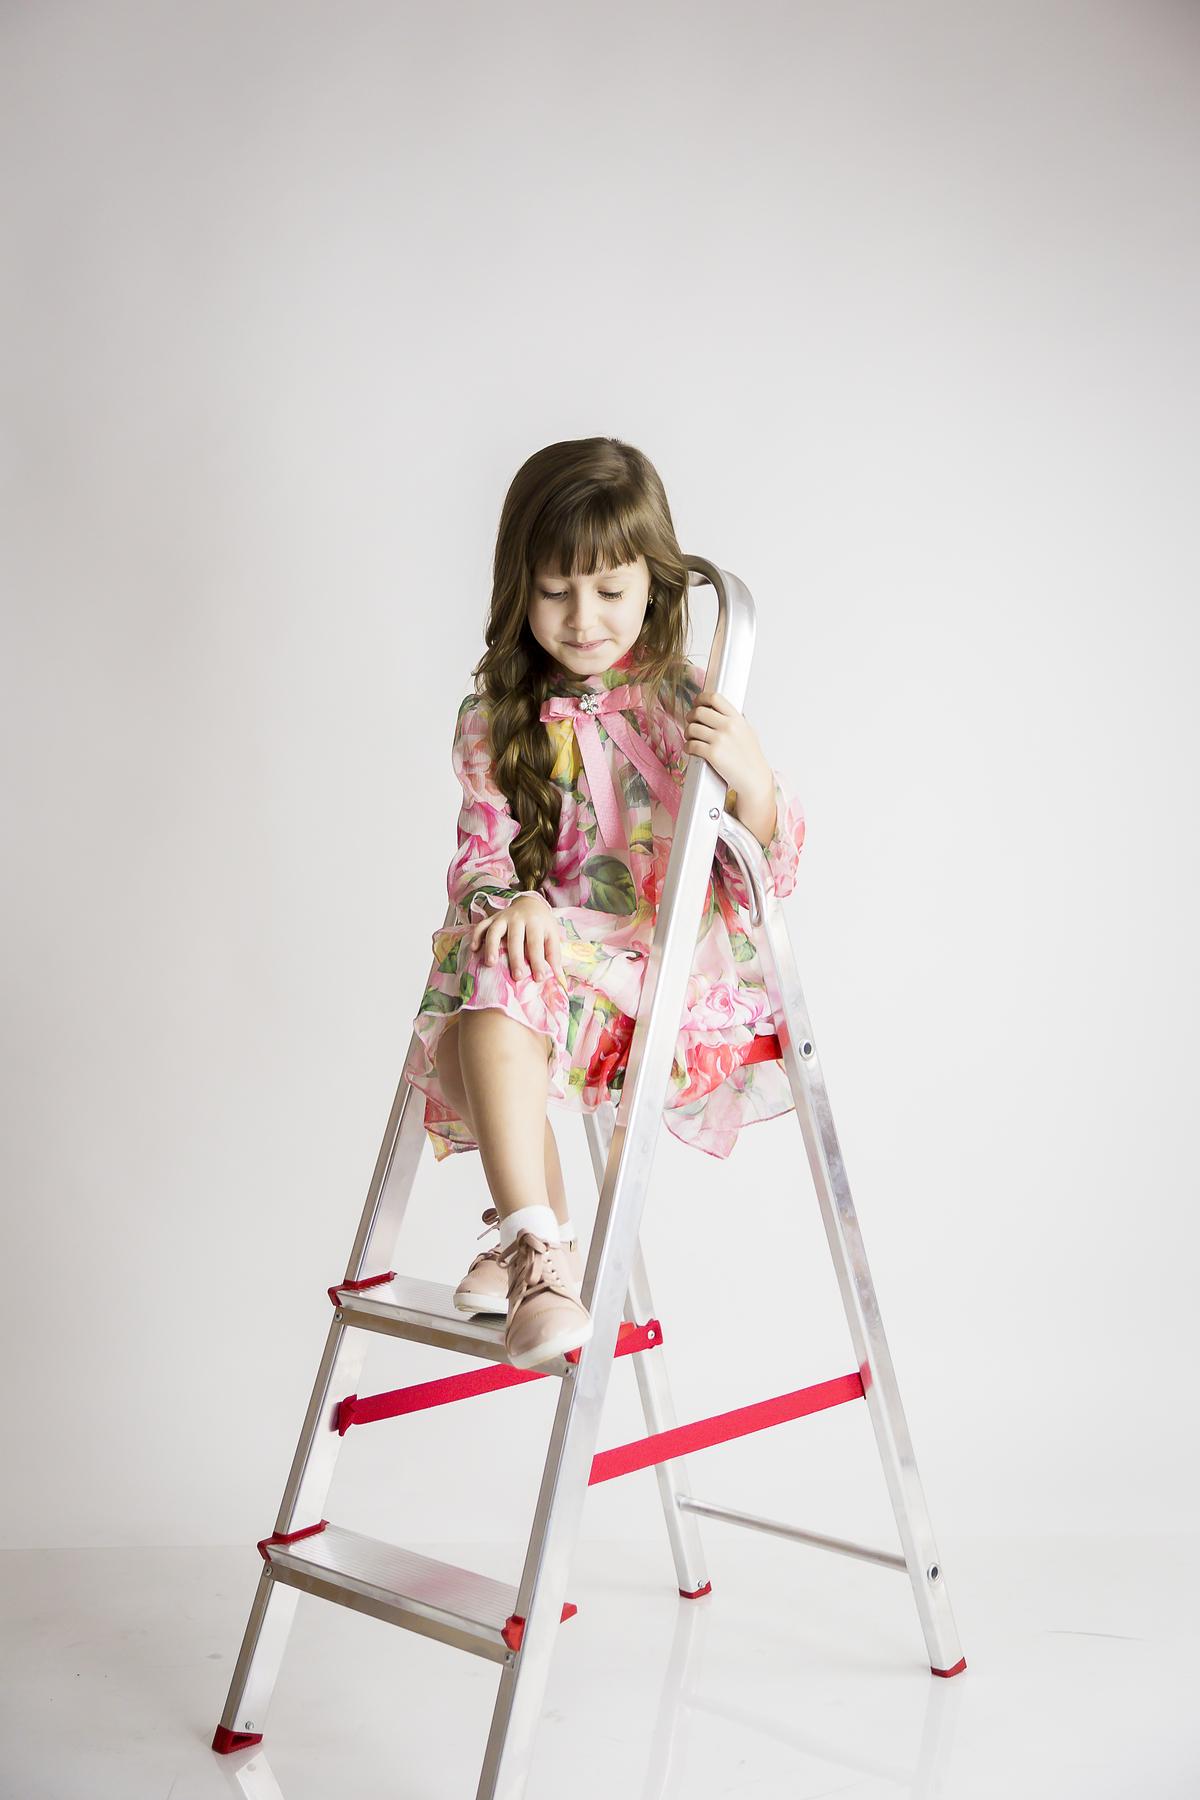 Fotografia infantil em Brasilia, book editorial menina